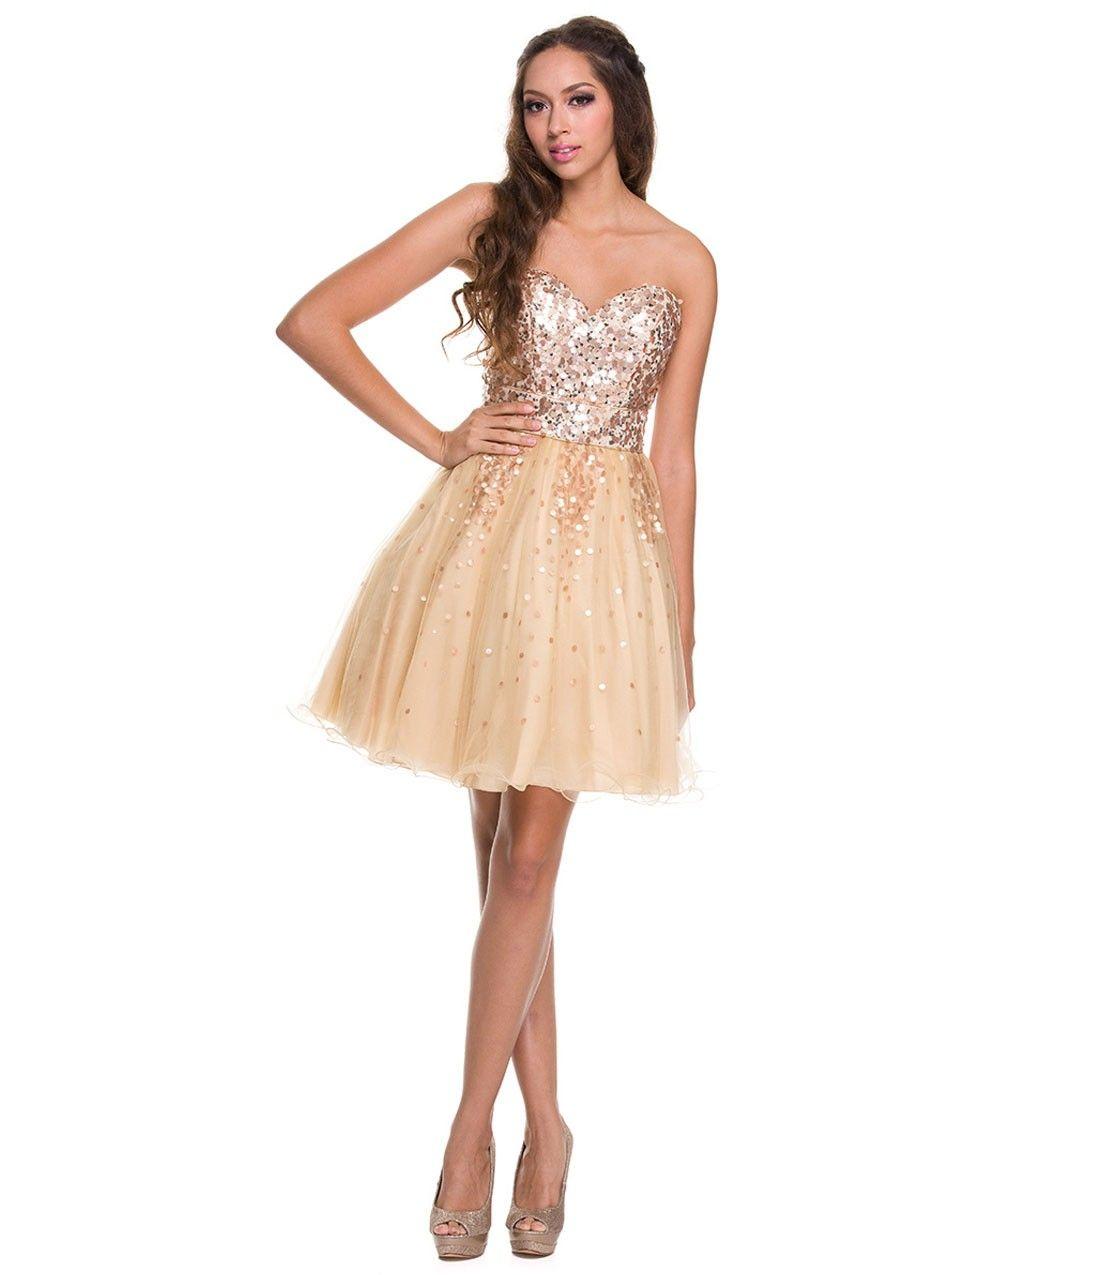 Winter Formal Dresses 2015